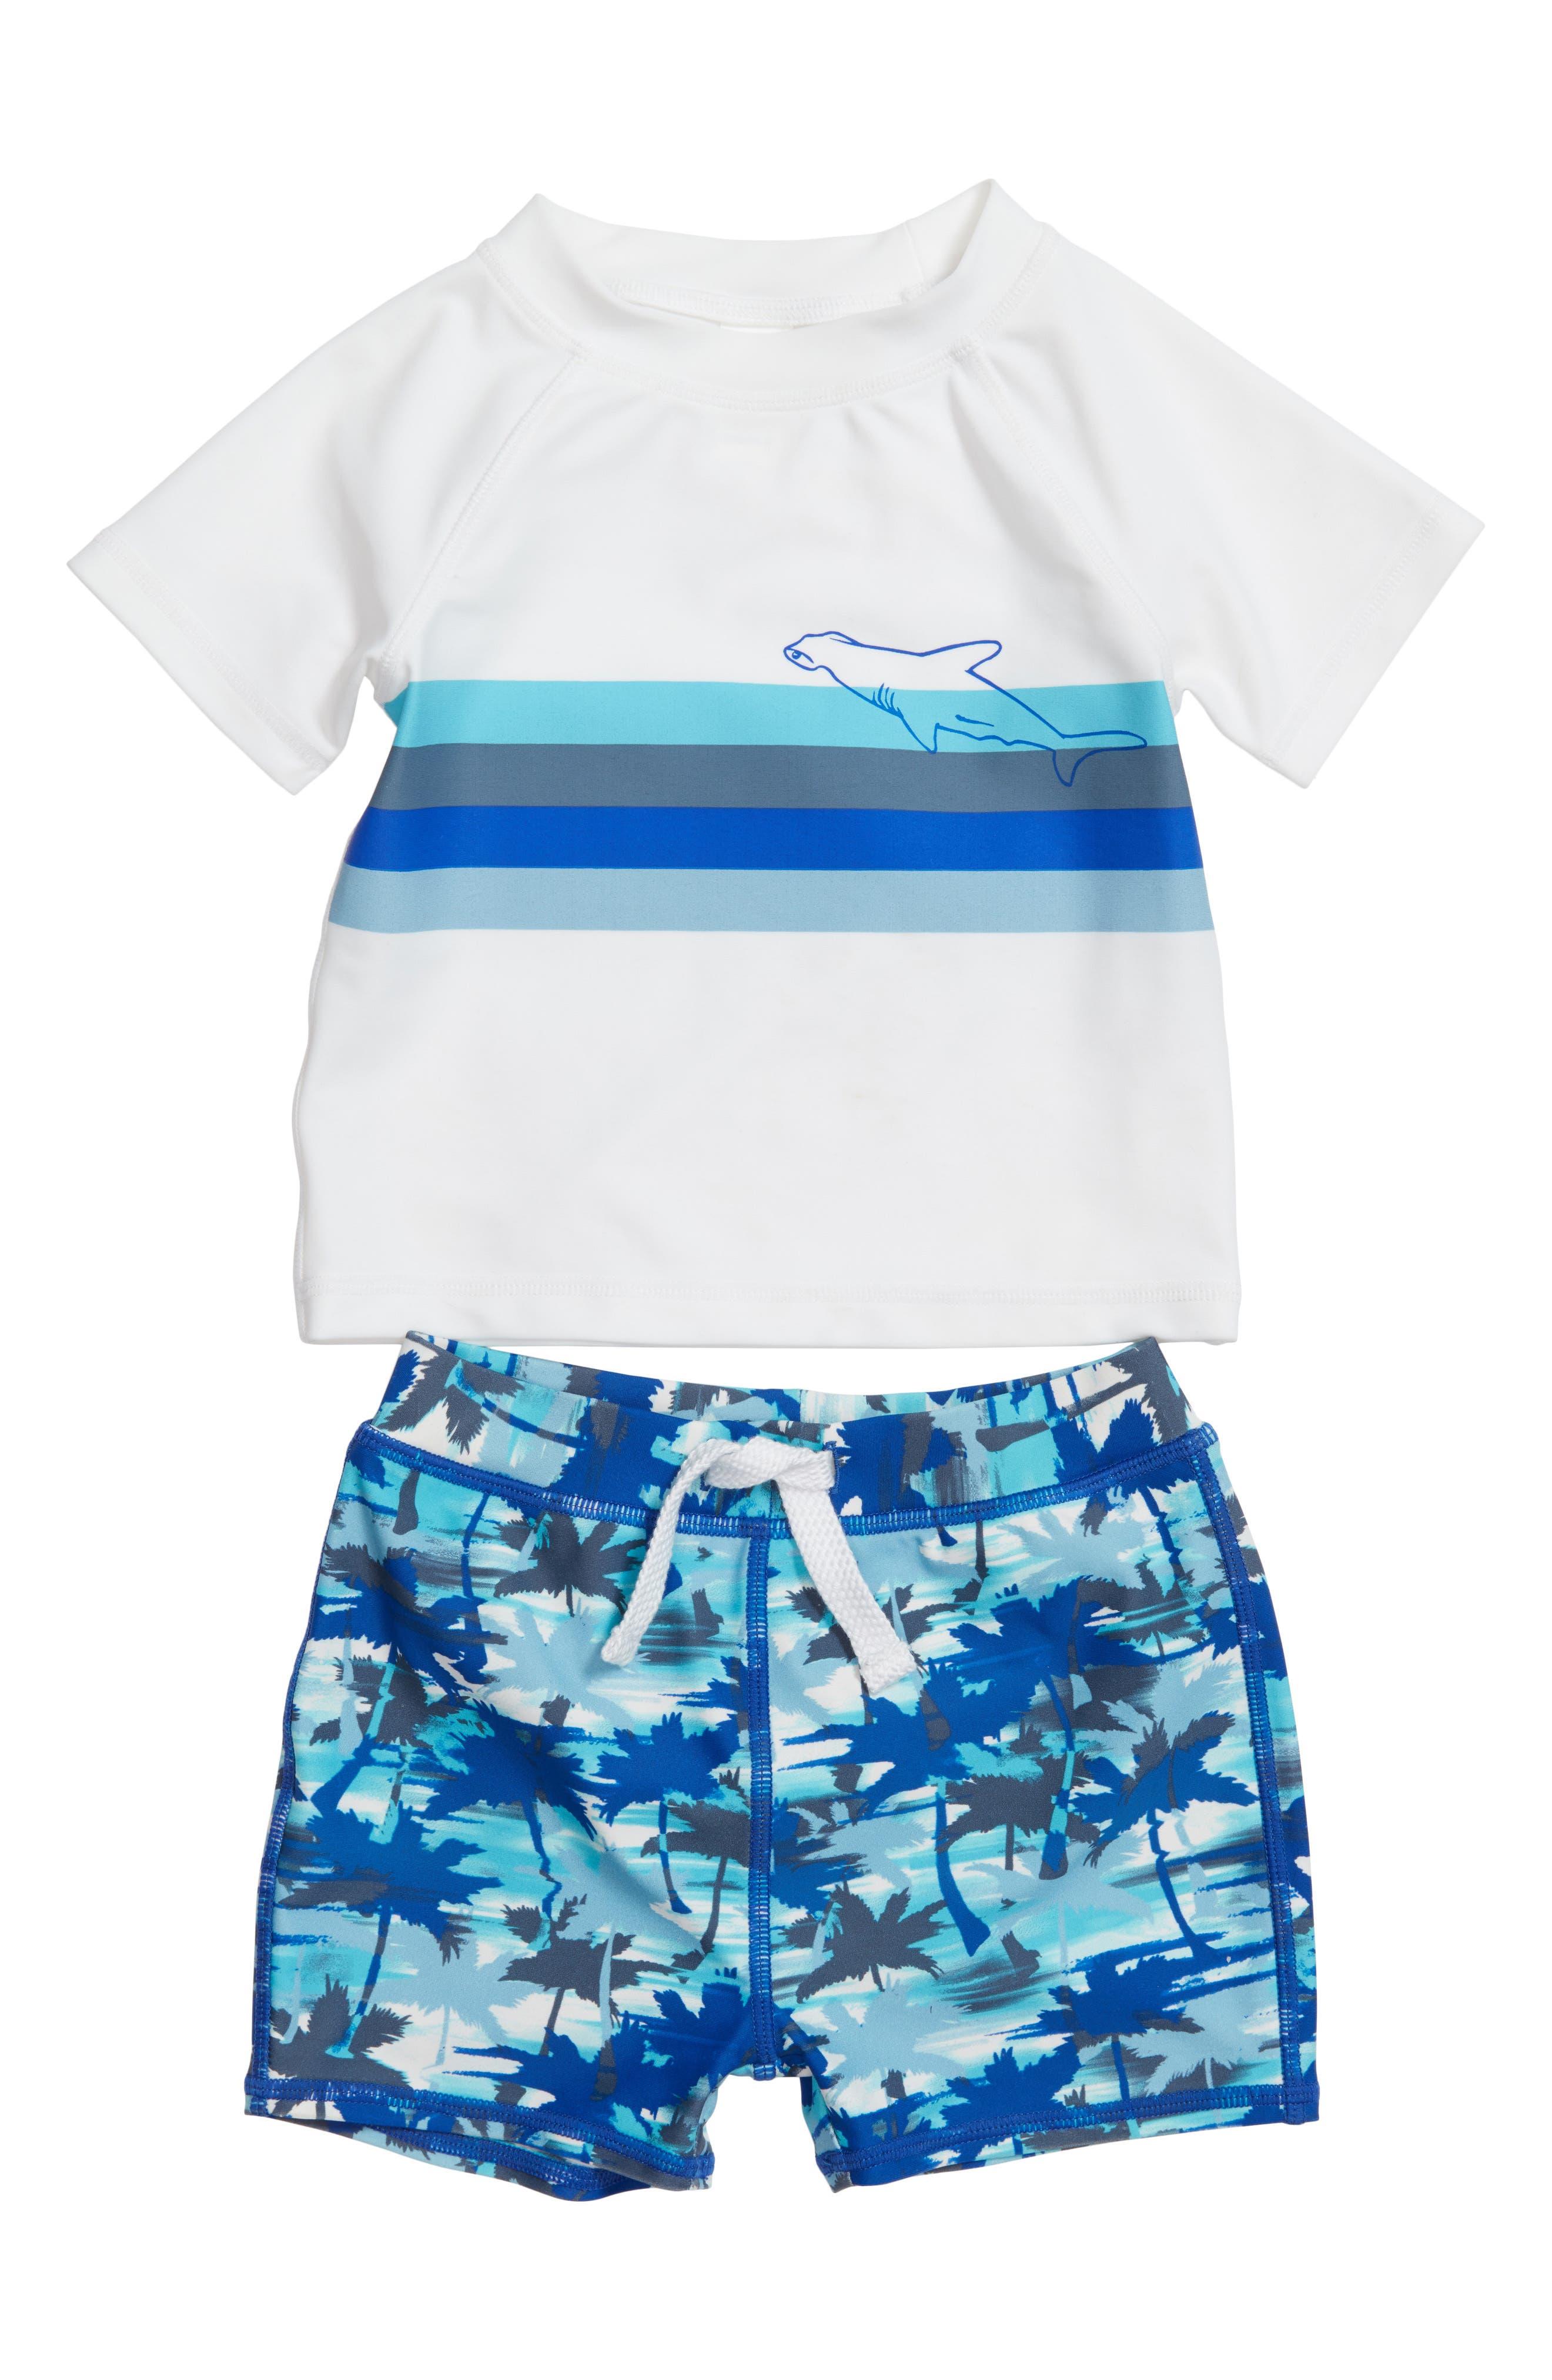 Two-Piece Rashguard Swimsuit,                             Main thumbnail 1, color,                             White- Blue Palm Haze